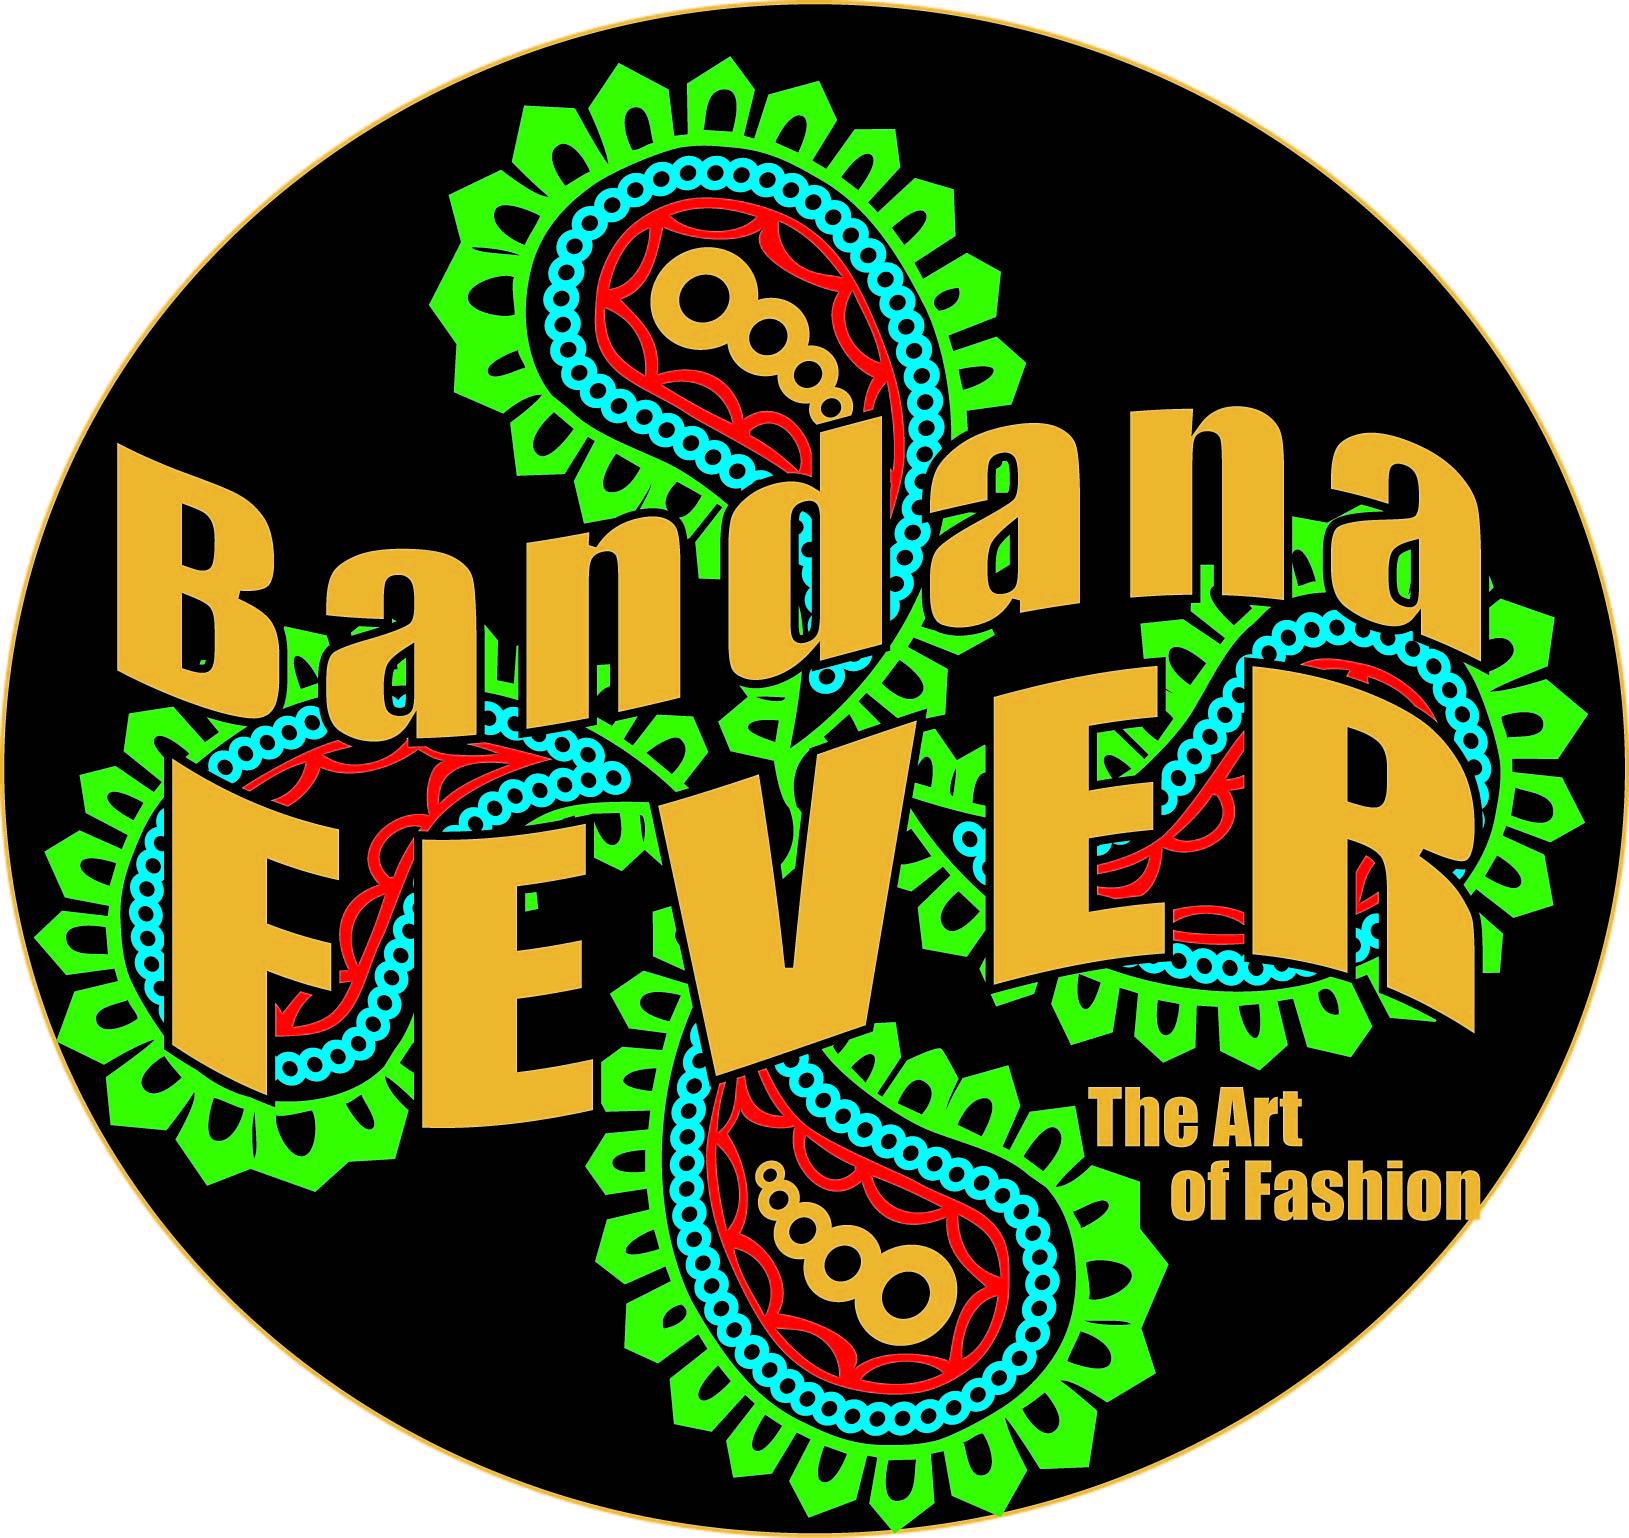 Shop Custom Shoes at Bandana Fever